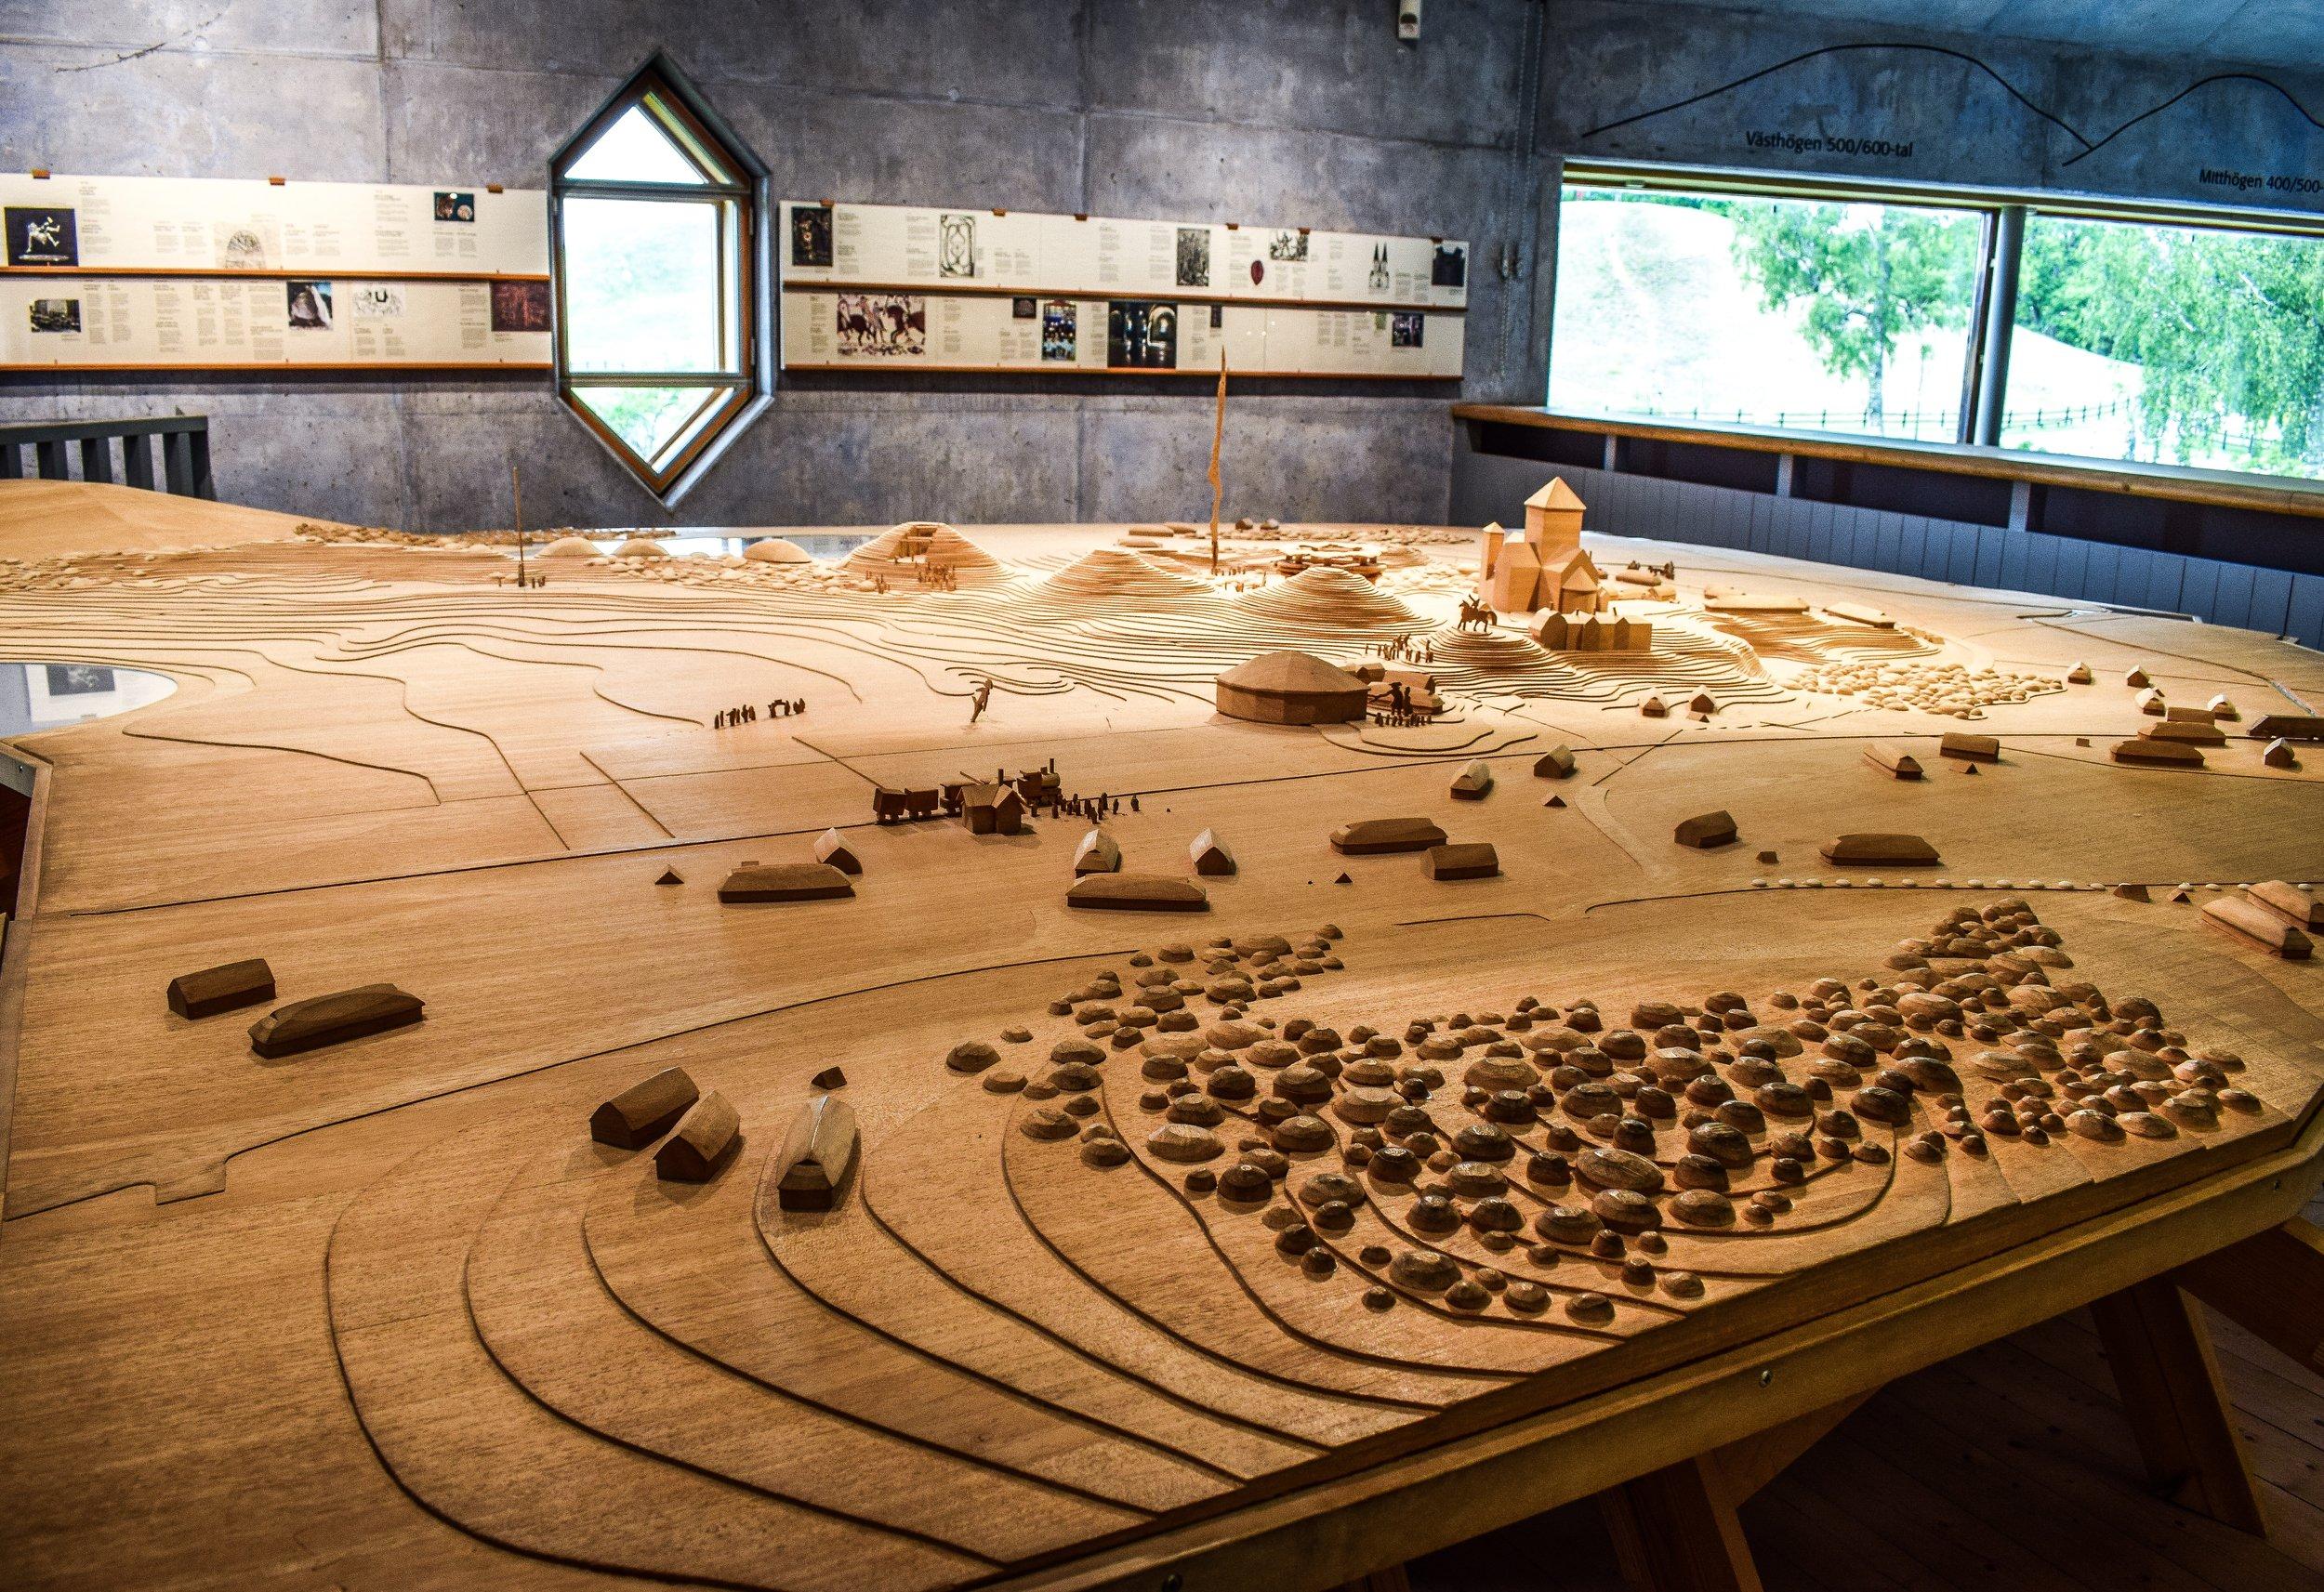 gamla uppsala carved in wood, gamla uppsala museum